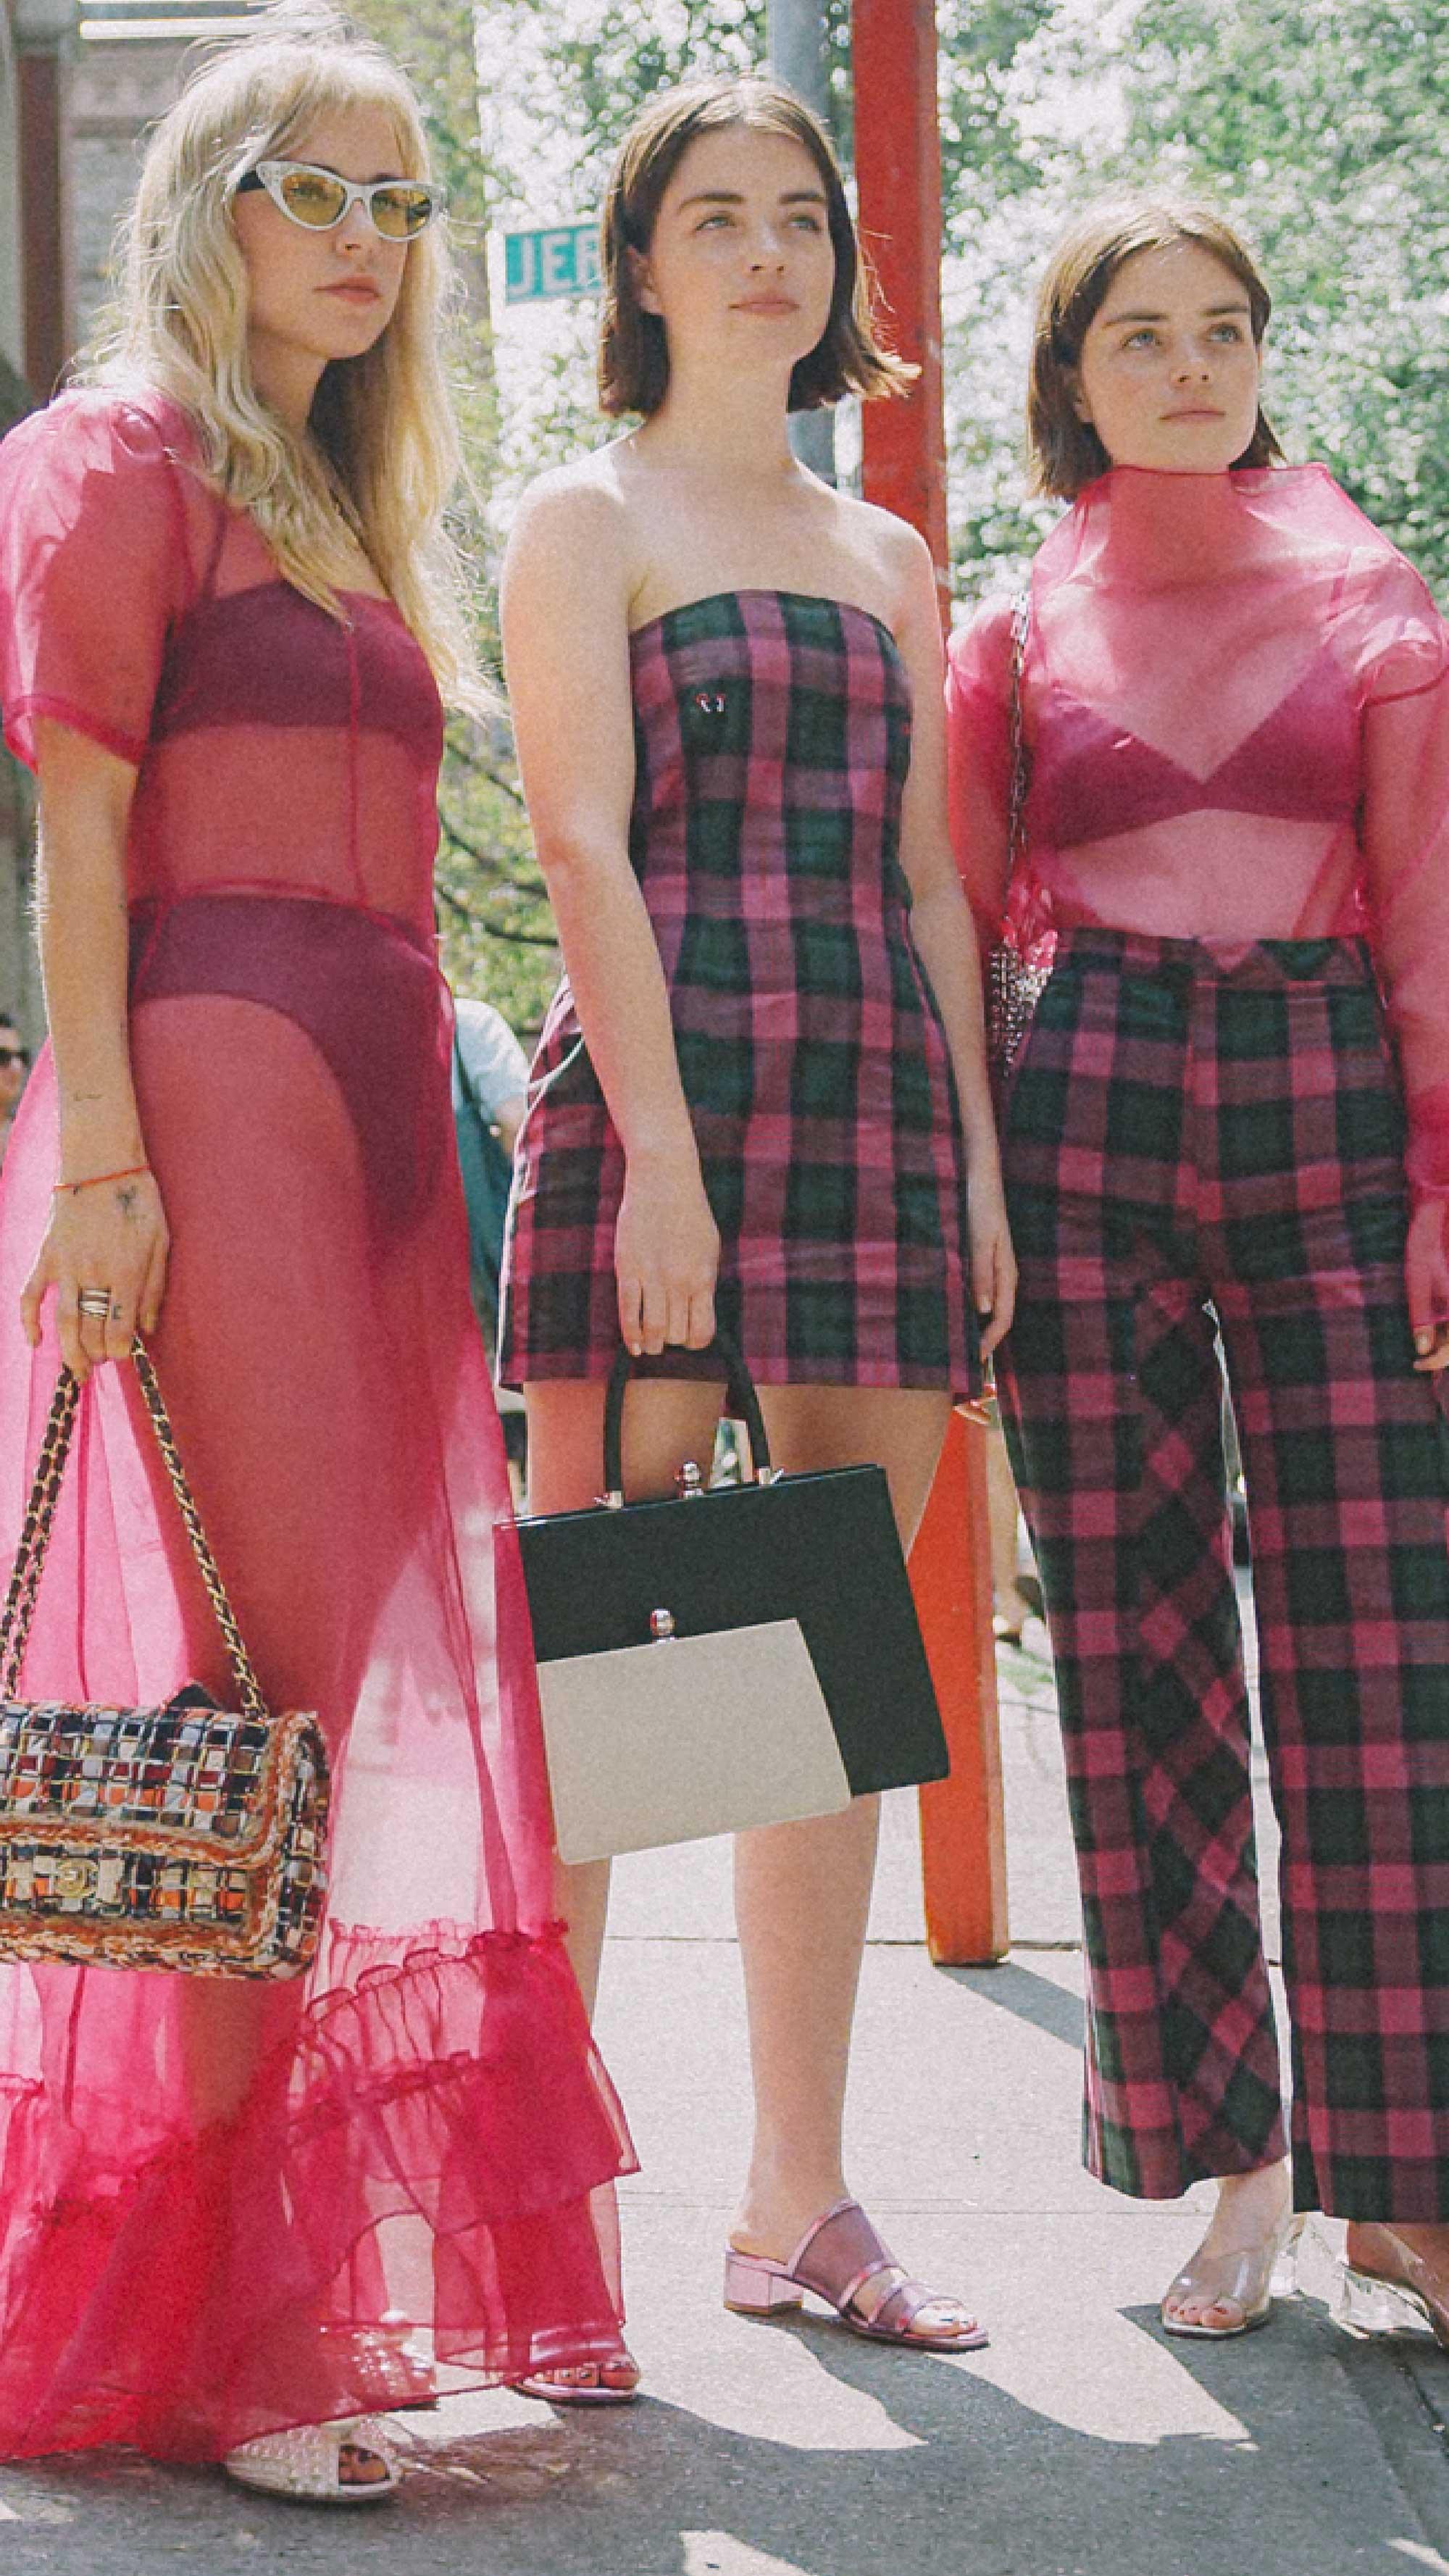 New-York-Fashion-Week-NYFW-SS18-street-style-day-one1.jpg